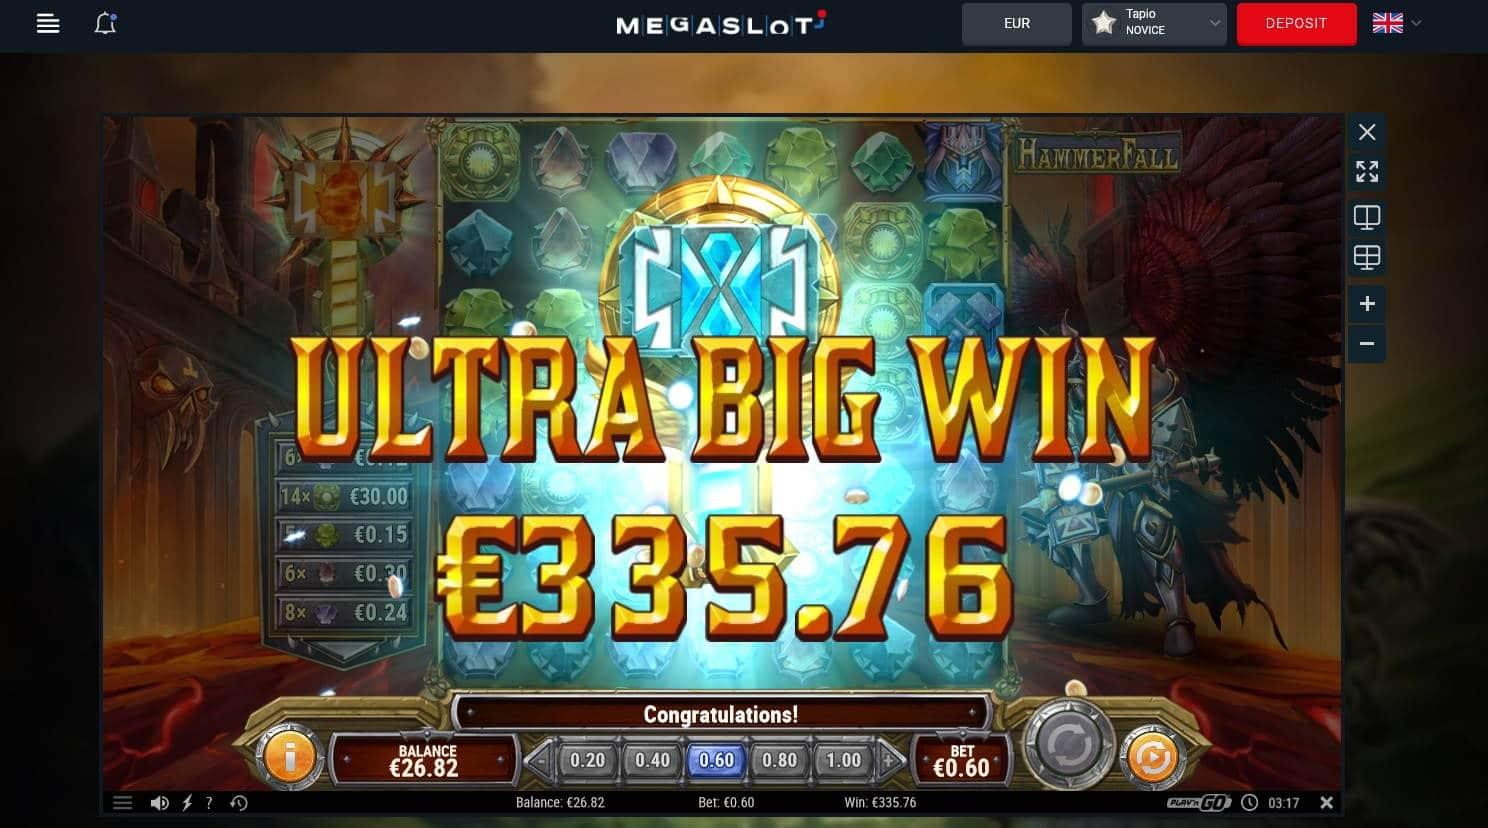 Hammerfall Casino win picture by Mrmork666 31.5.2021 335.76e 560X